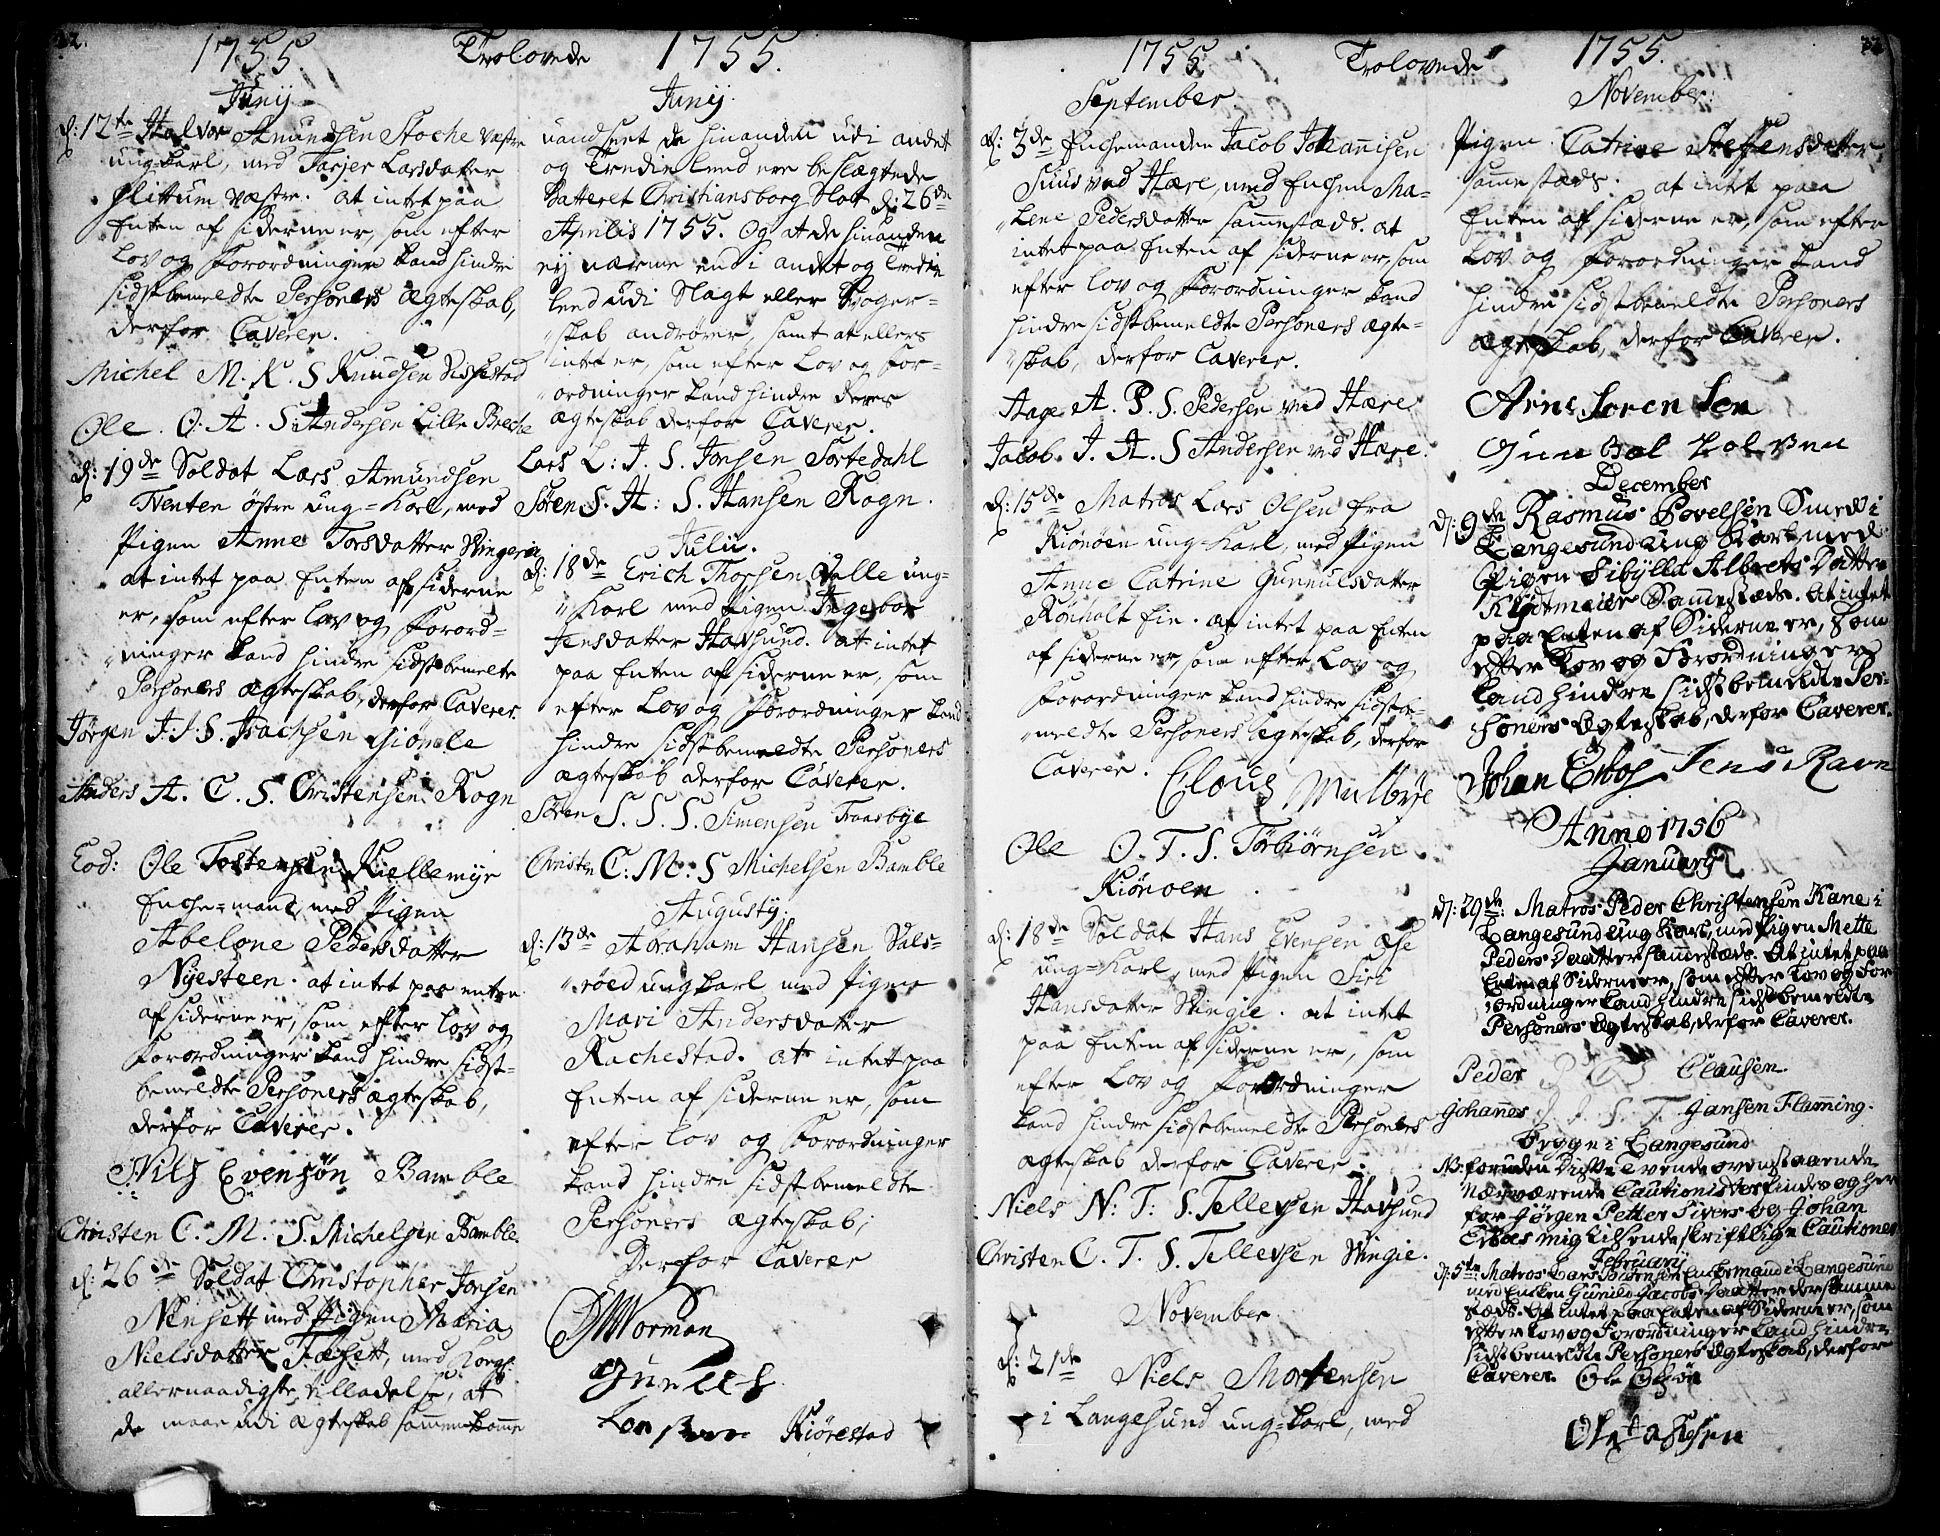 SAKO, Bamble kirkebøker, F/Fa/L0001: Ministerialbok nr. I 1, 1702-1774, s. 32-33